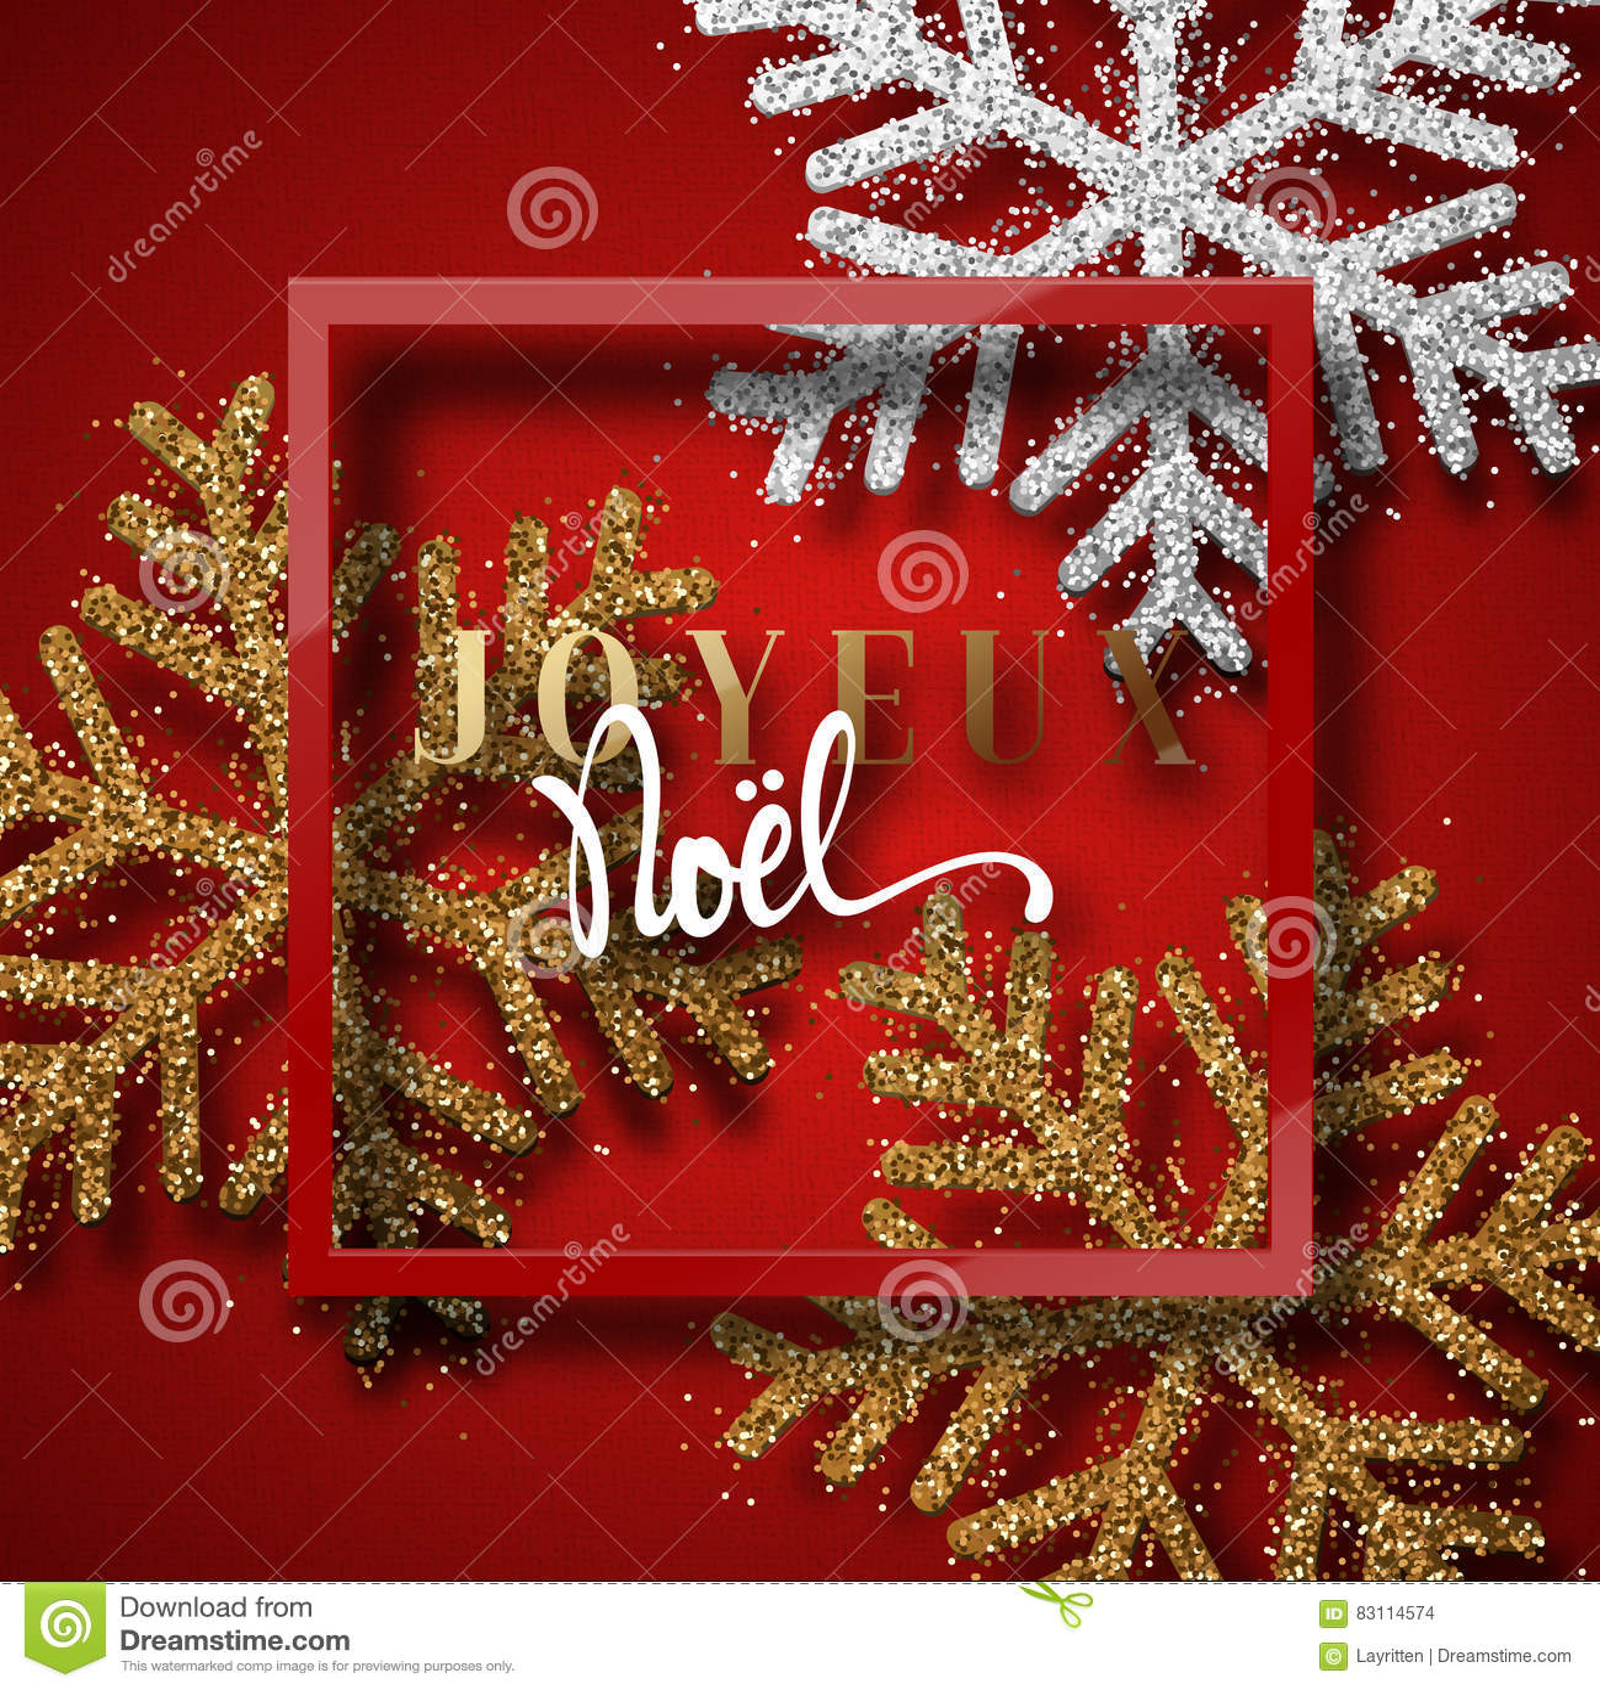 download merry christmas french inscription joyeux noel stock vector illustration of decorative - Merry Christmas French